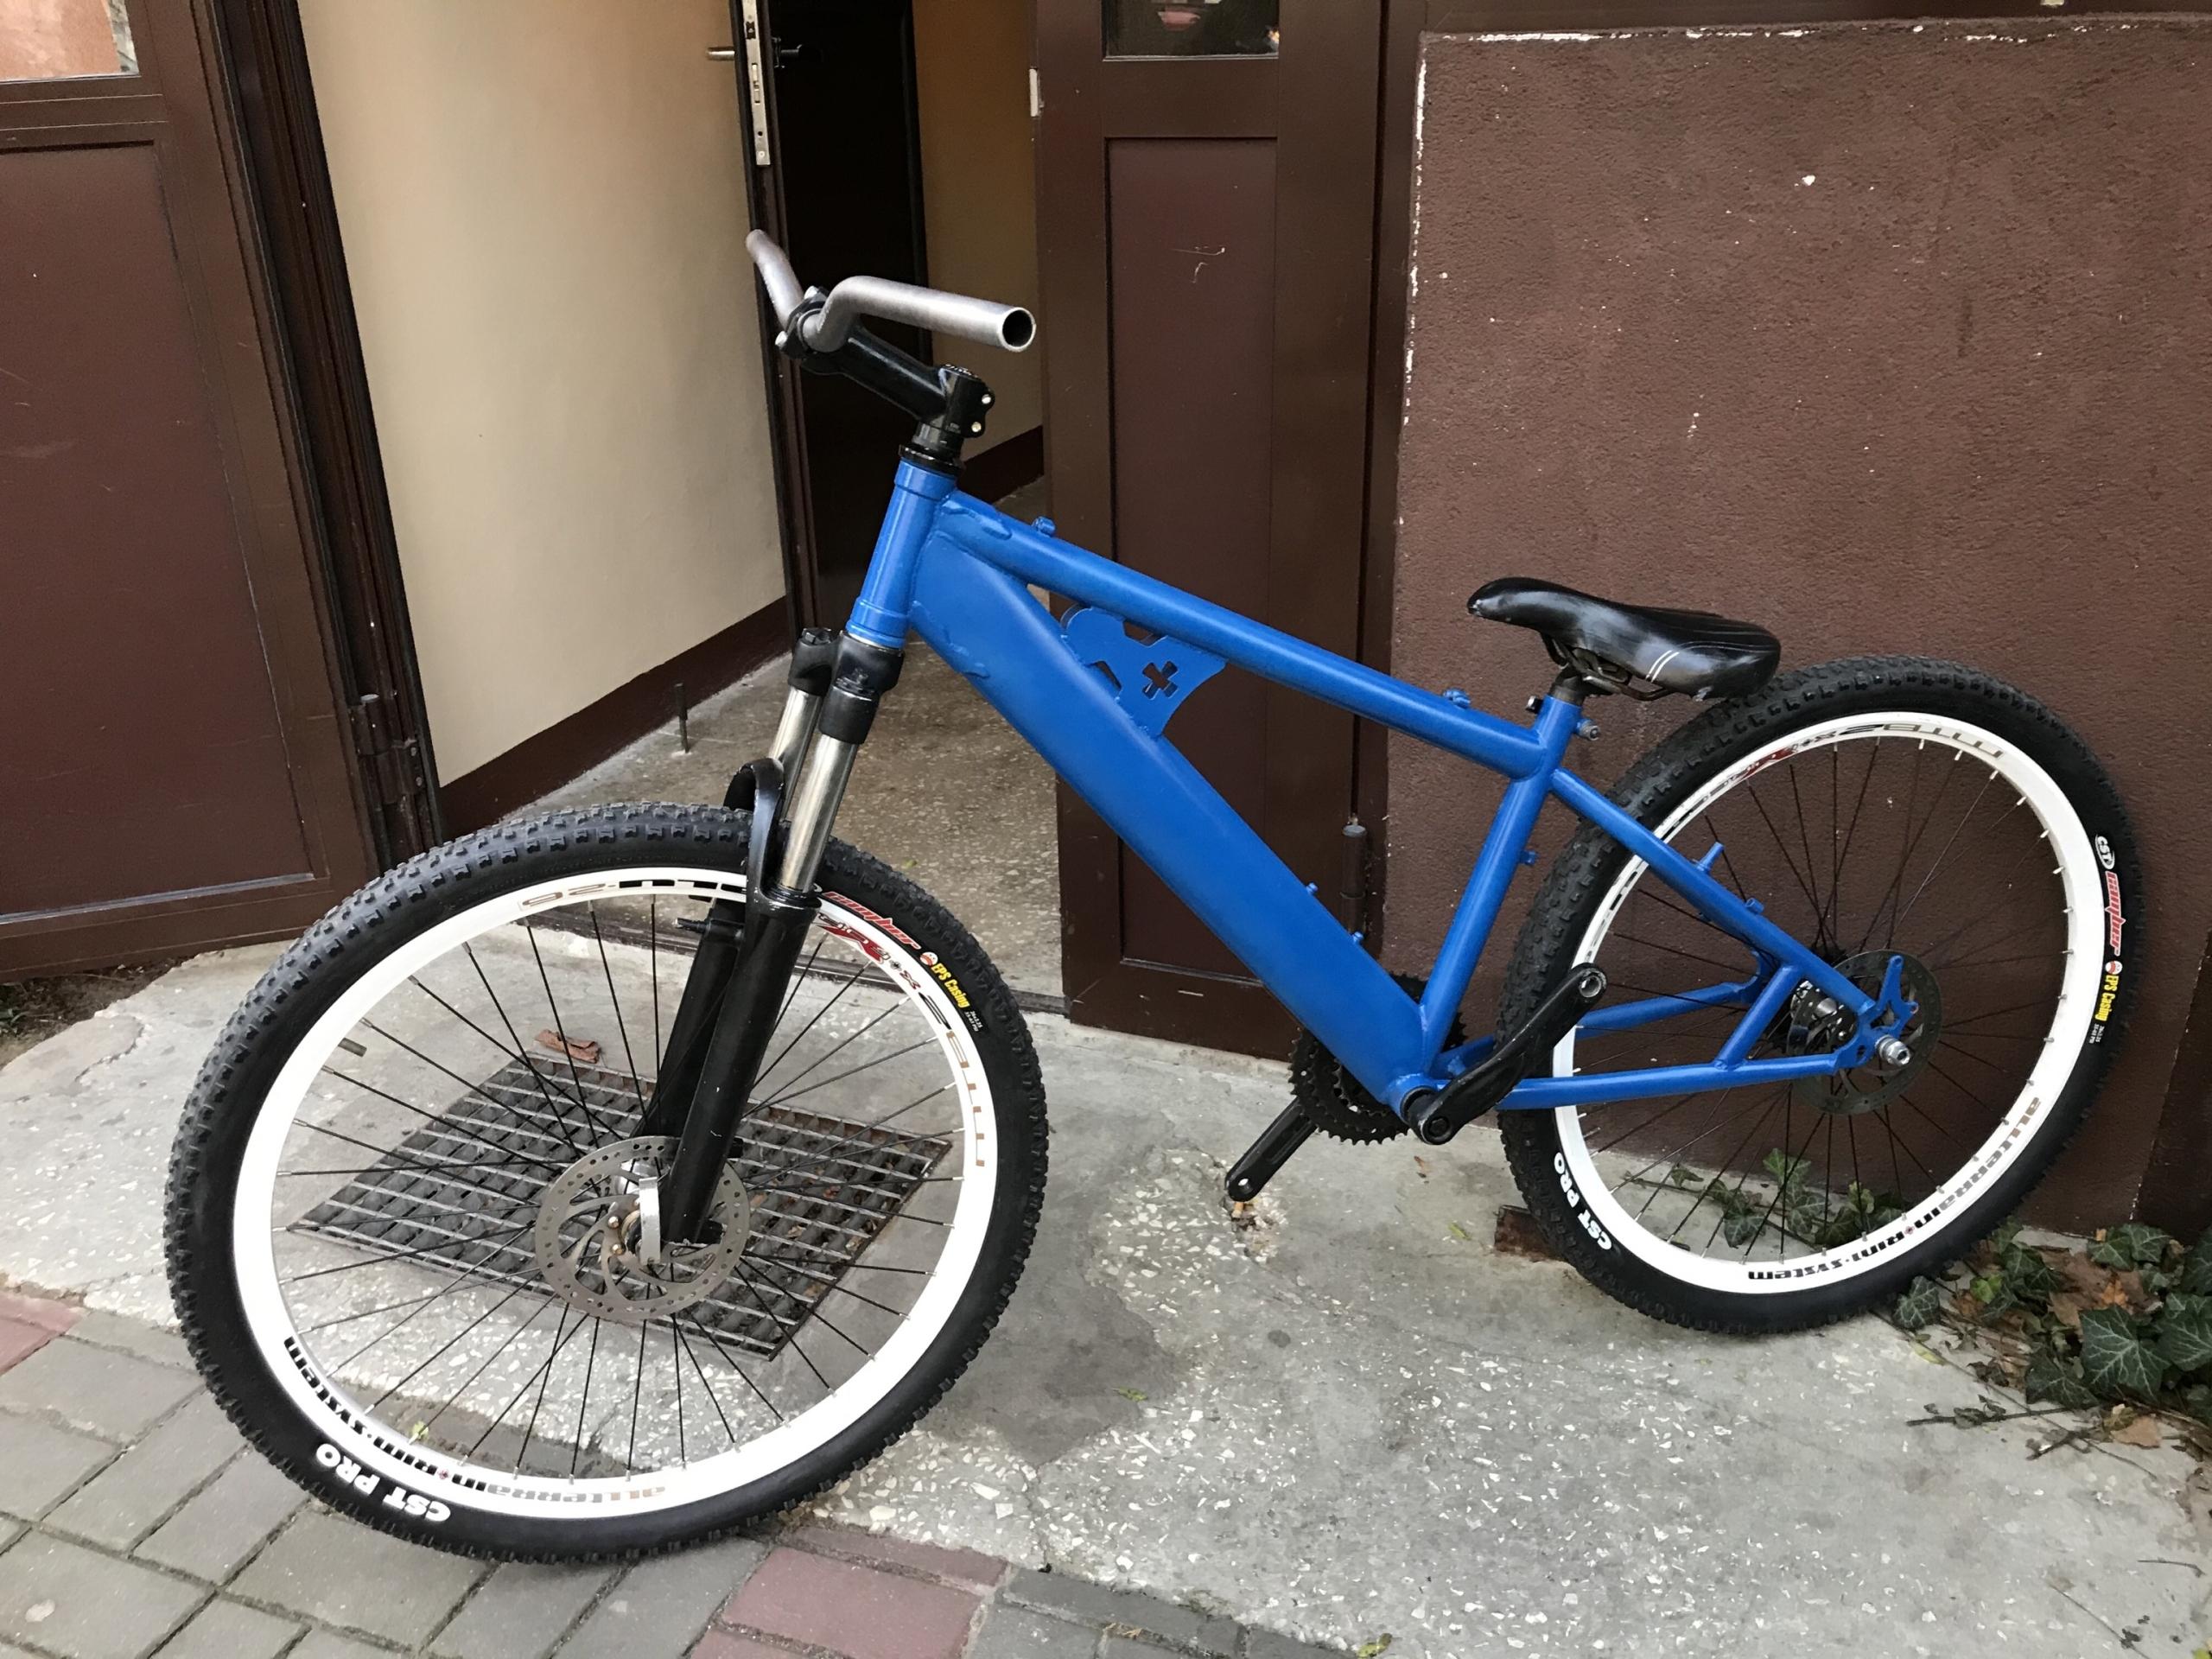 Rower Gtx 26 Mtb Dirt Stunt Kup Teraz Za 650 00 Zl Radom Allegro Lokalnie